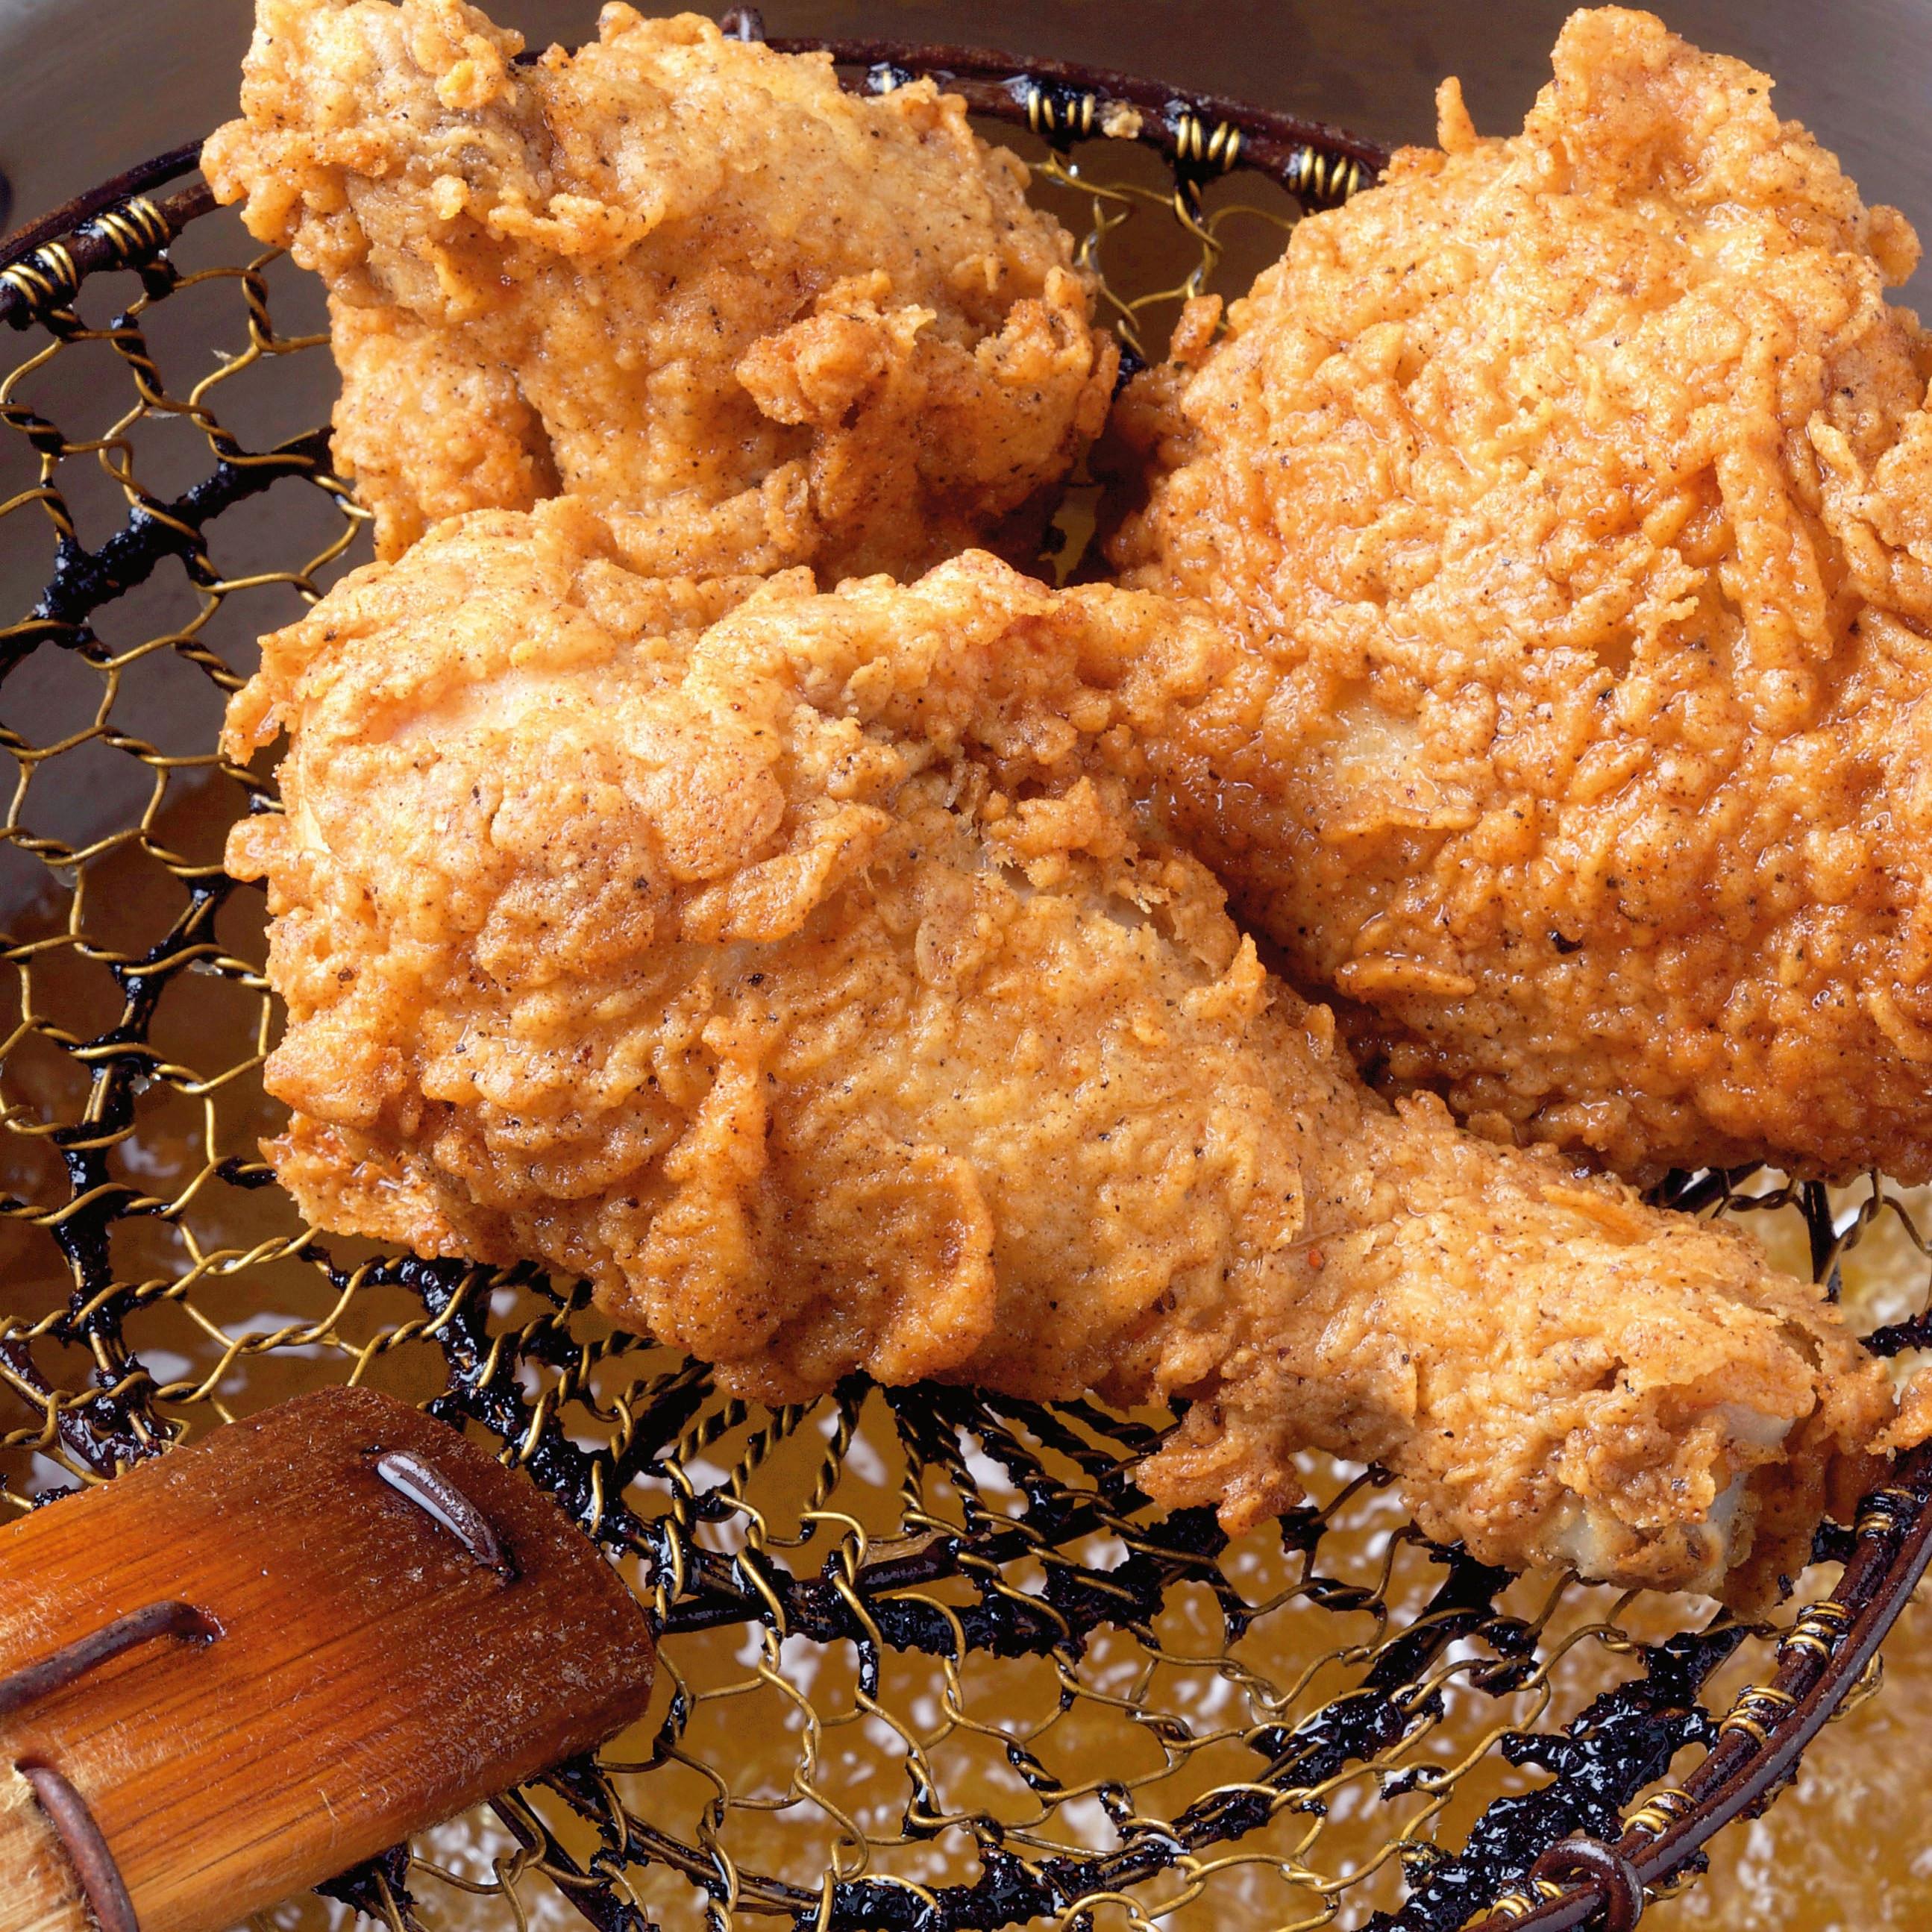 Fried Chicken Recipes  Rosemary Brined Buttermilk Fried Chicken recipe